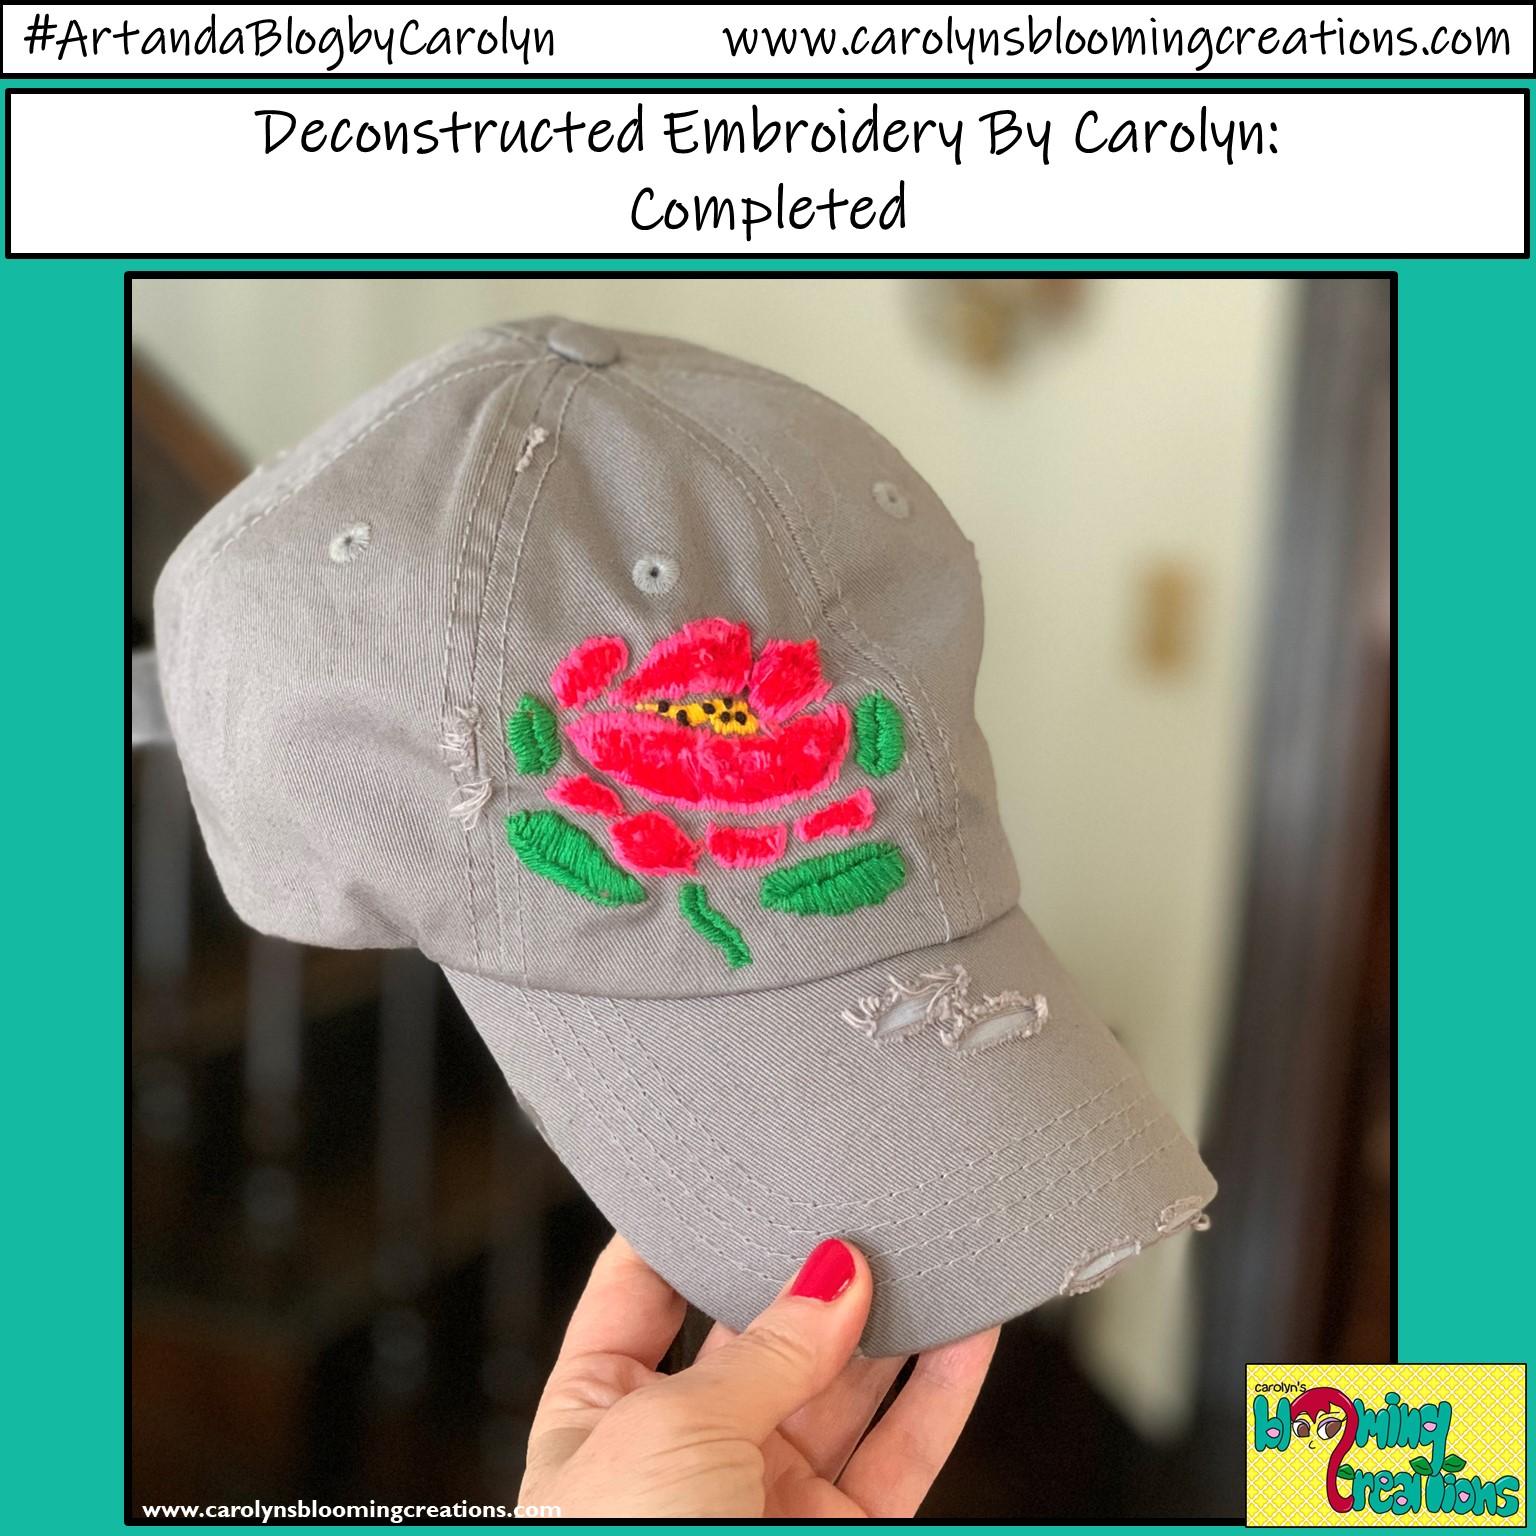 Carolyn Braden Embroidery Rose on Hat 1.jpg